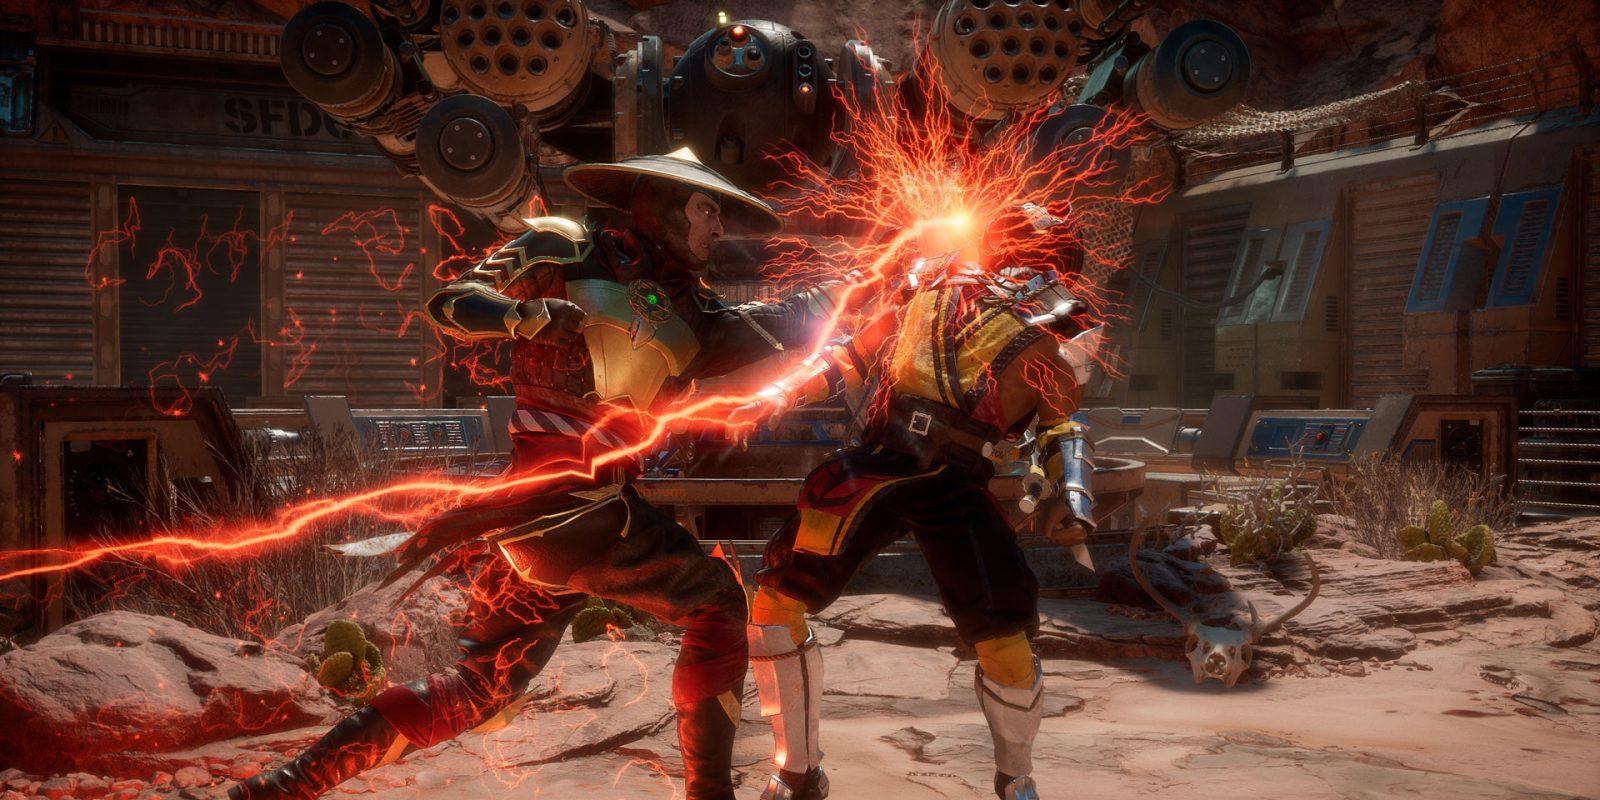 Mortal Kombat movie scheduled to start filming this year ...